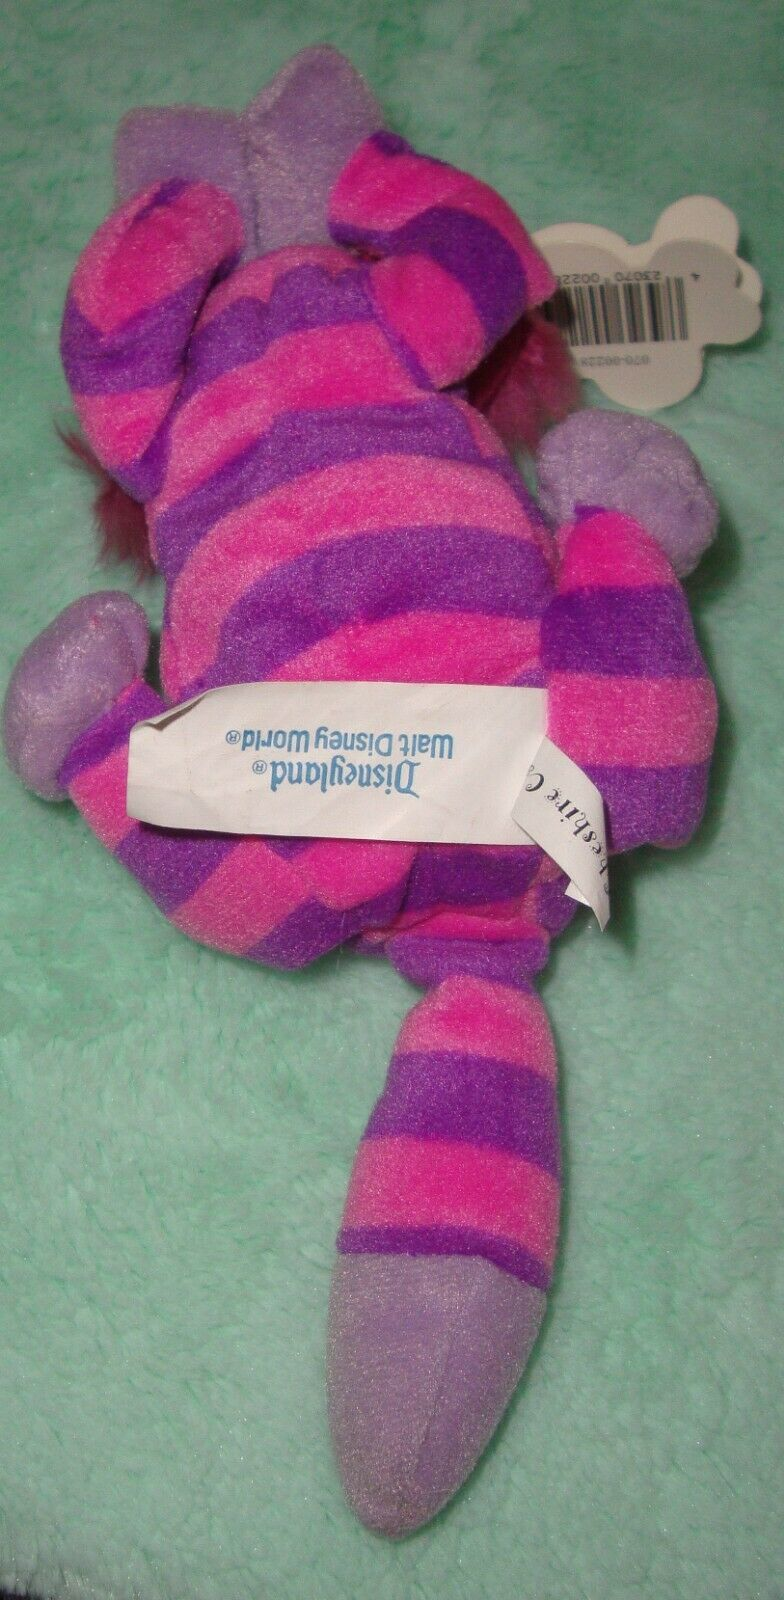 New DisneyLand Mouse Toys Cheshire Cat Alice in Wonderland Bean Bag Plush